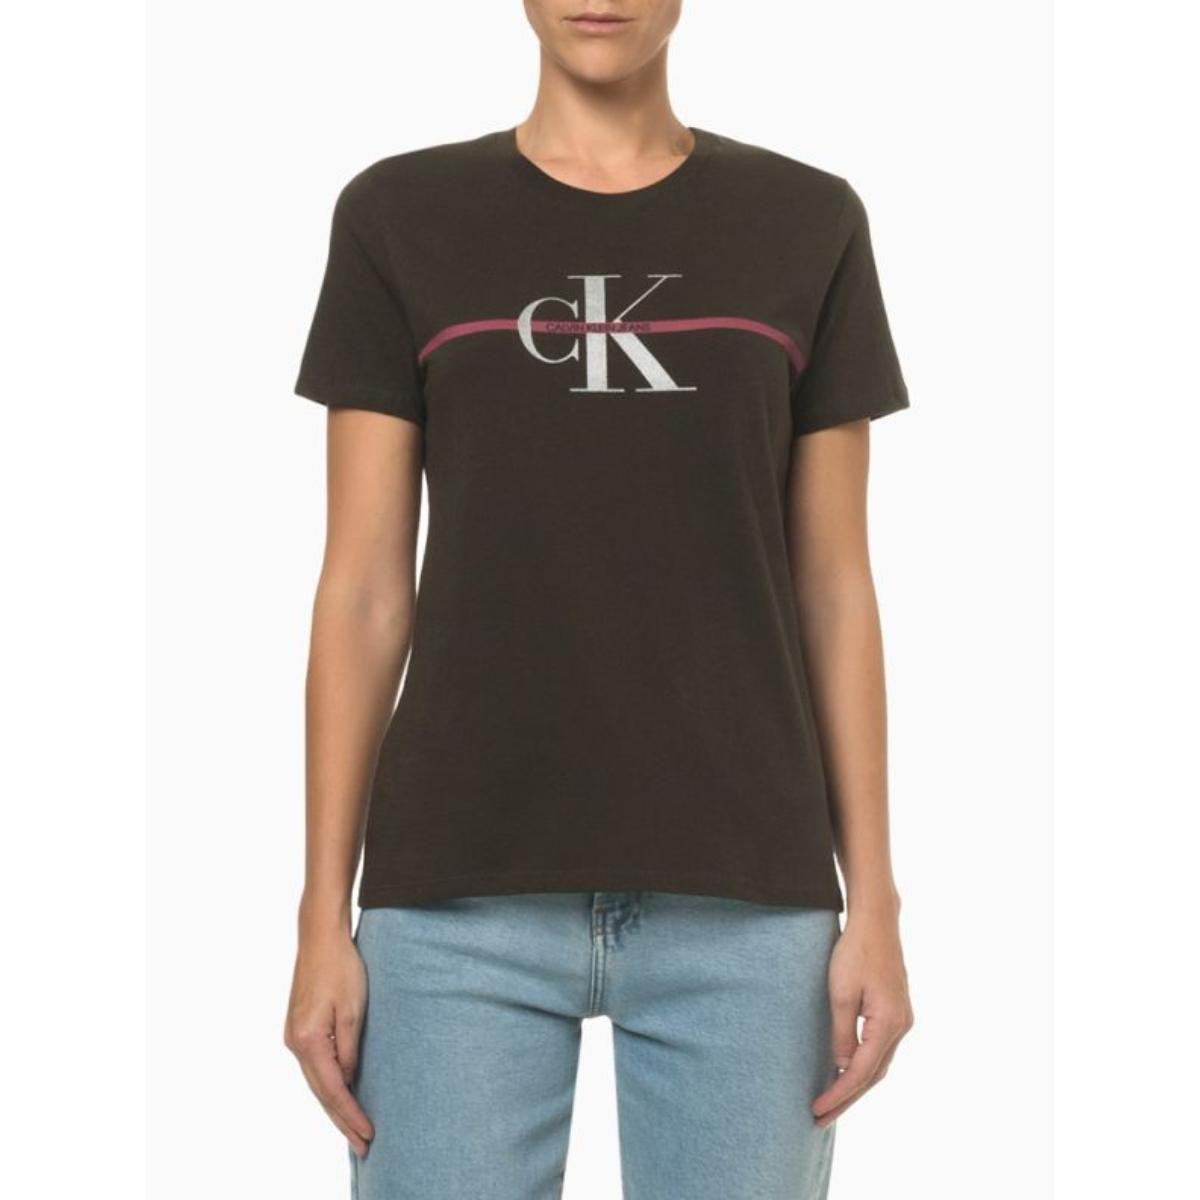 Camiseta Feminina Calvin Klein Cf1oc01bc739 Militar